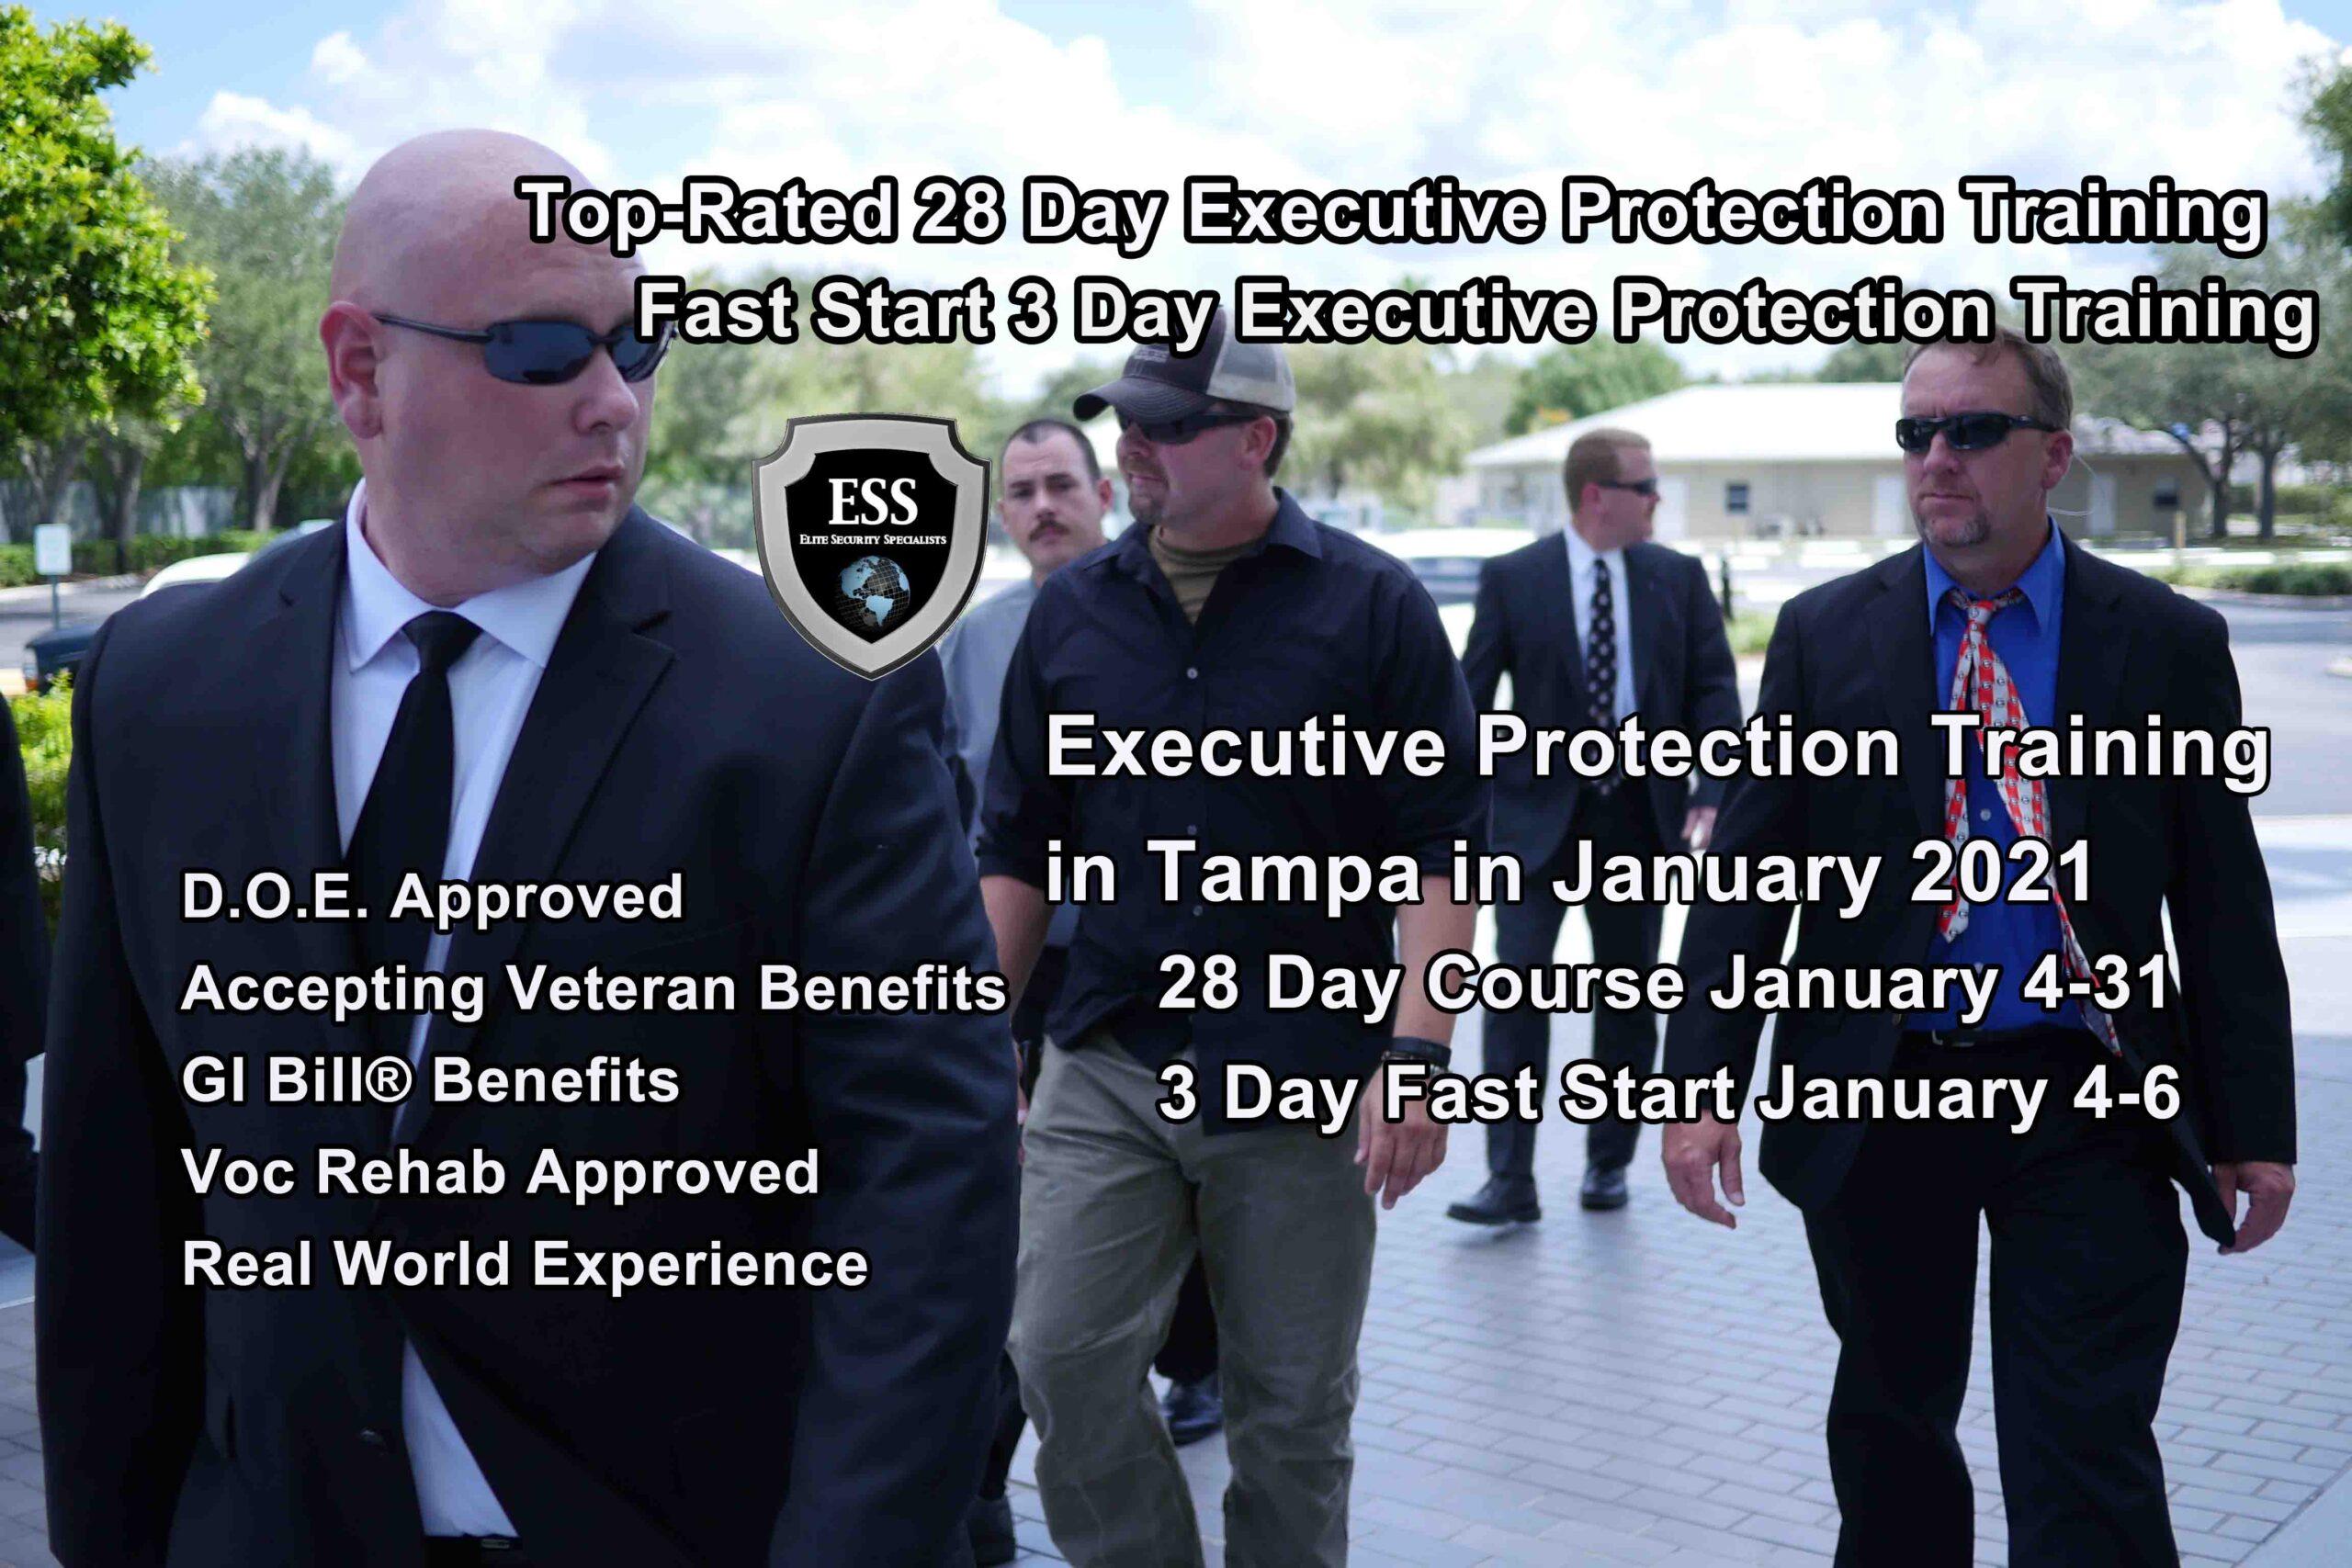 Executive Protection Training - Tampa 2 Courses January